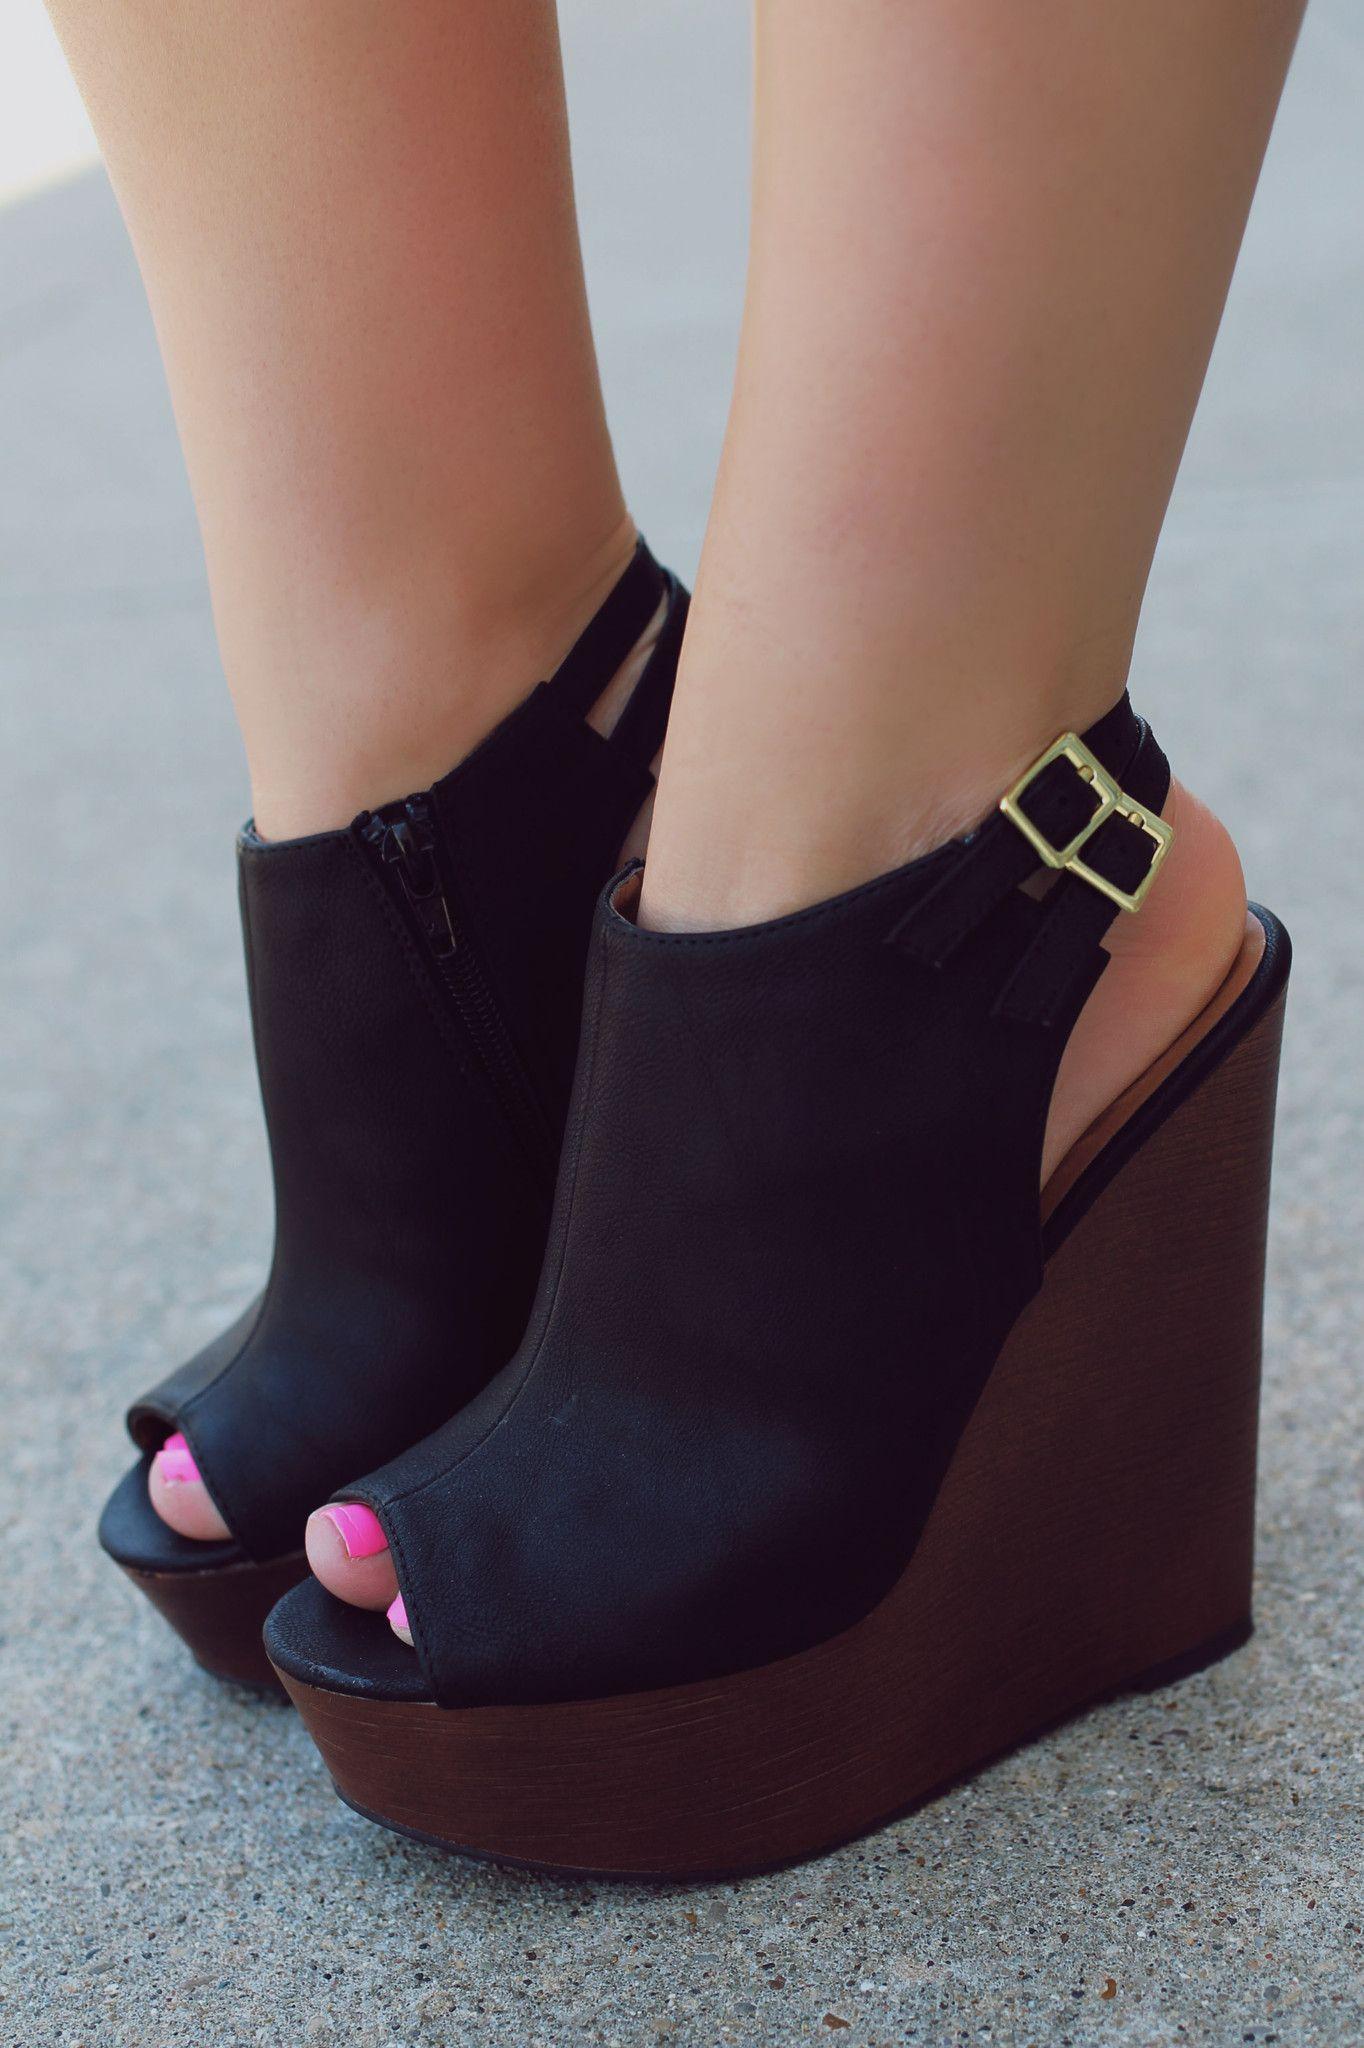 dress - How to peep wear toe wedge booties video